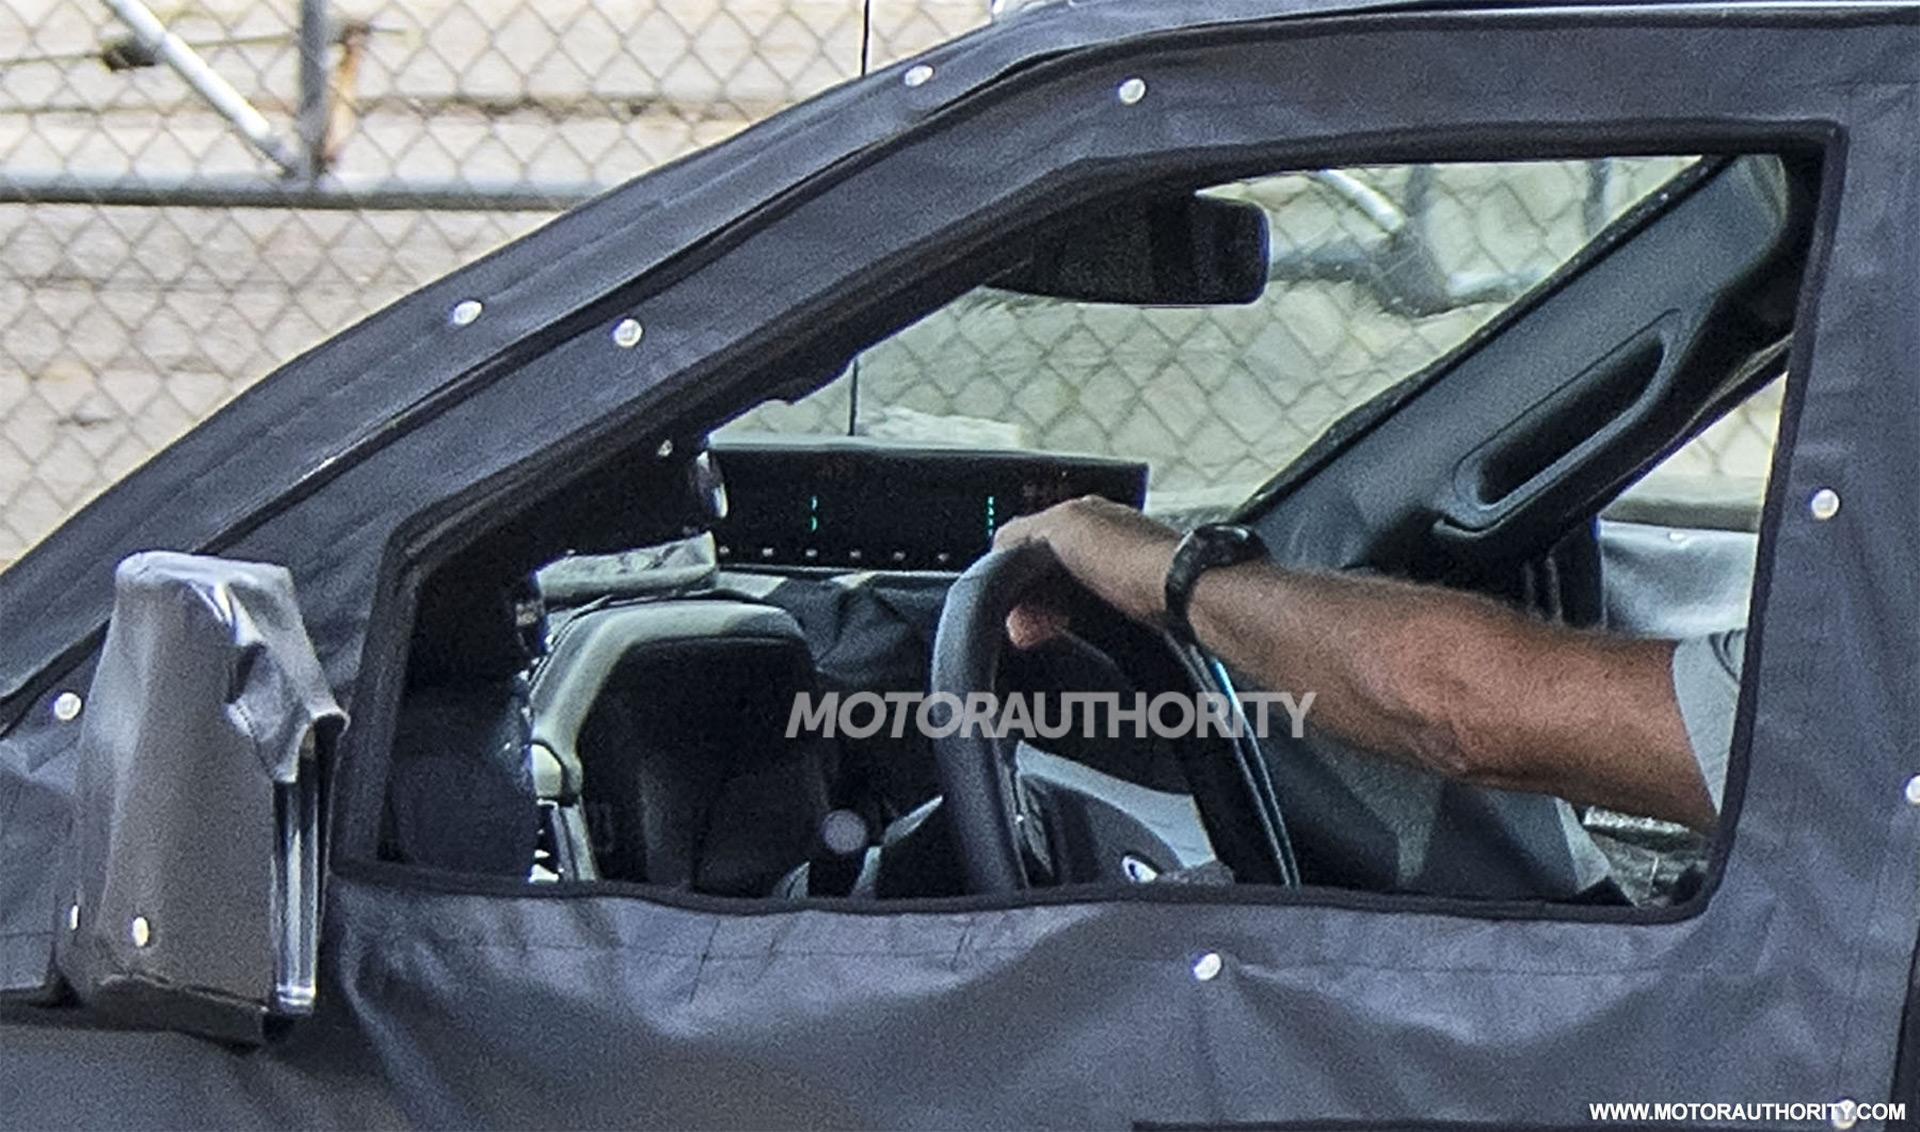 2020 - [Ford] F-Series 2021-ford-f-150-spy-shots--image-via-s-baldauf-sb-medien_100710864_h